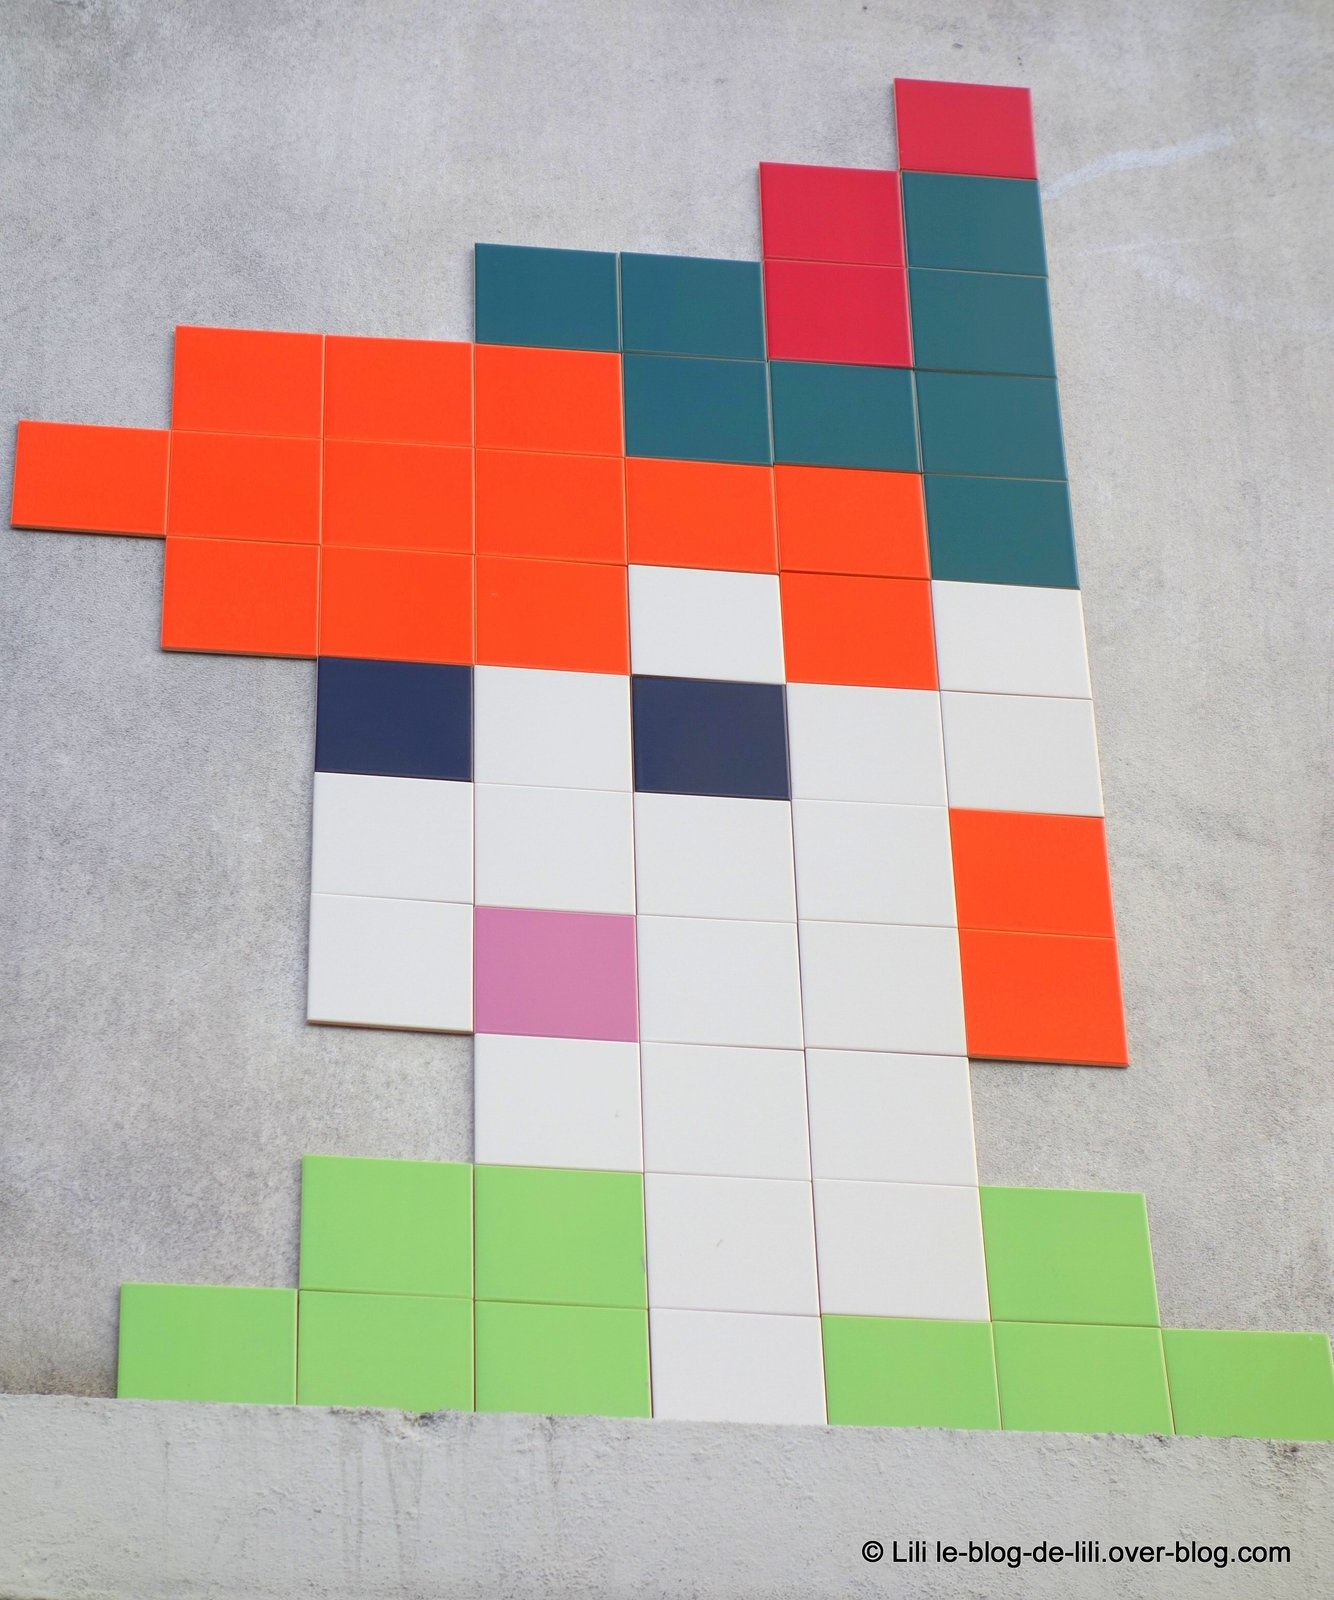 Promenades parisiennes : space invaders, street art & Cie